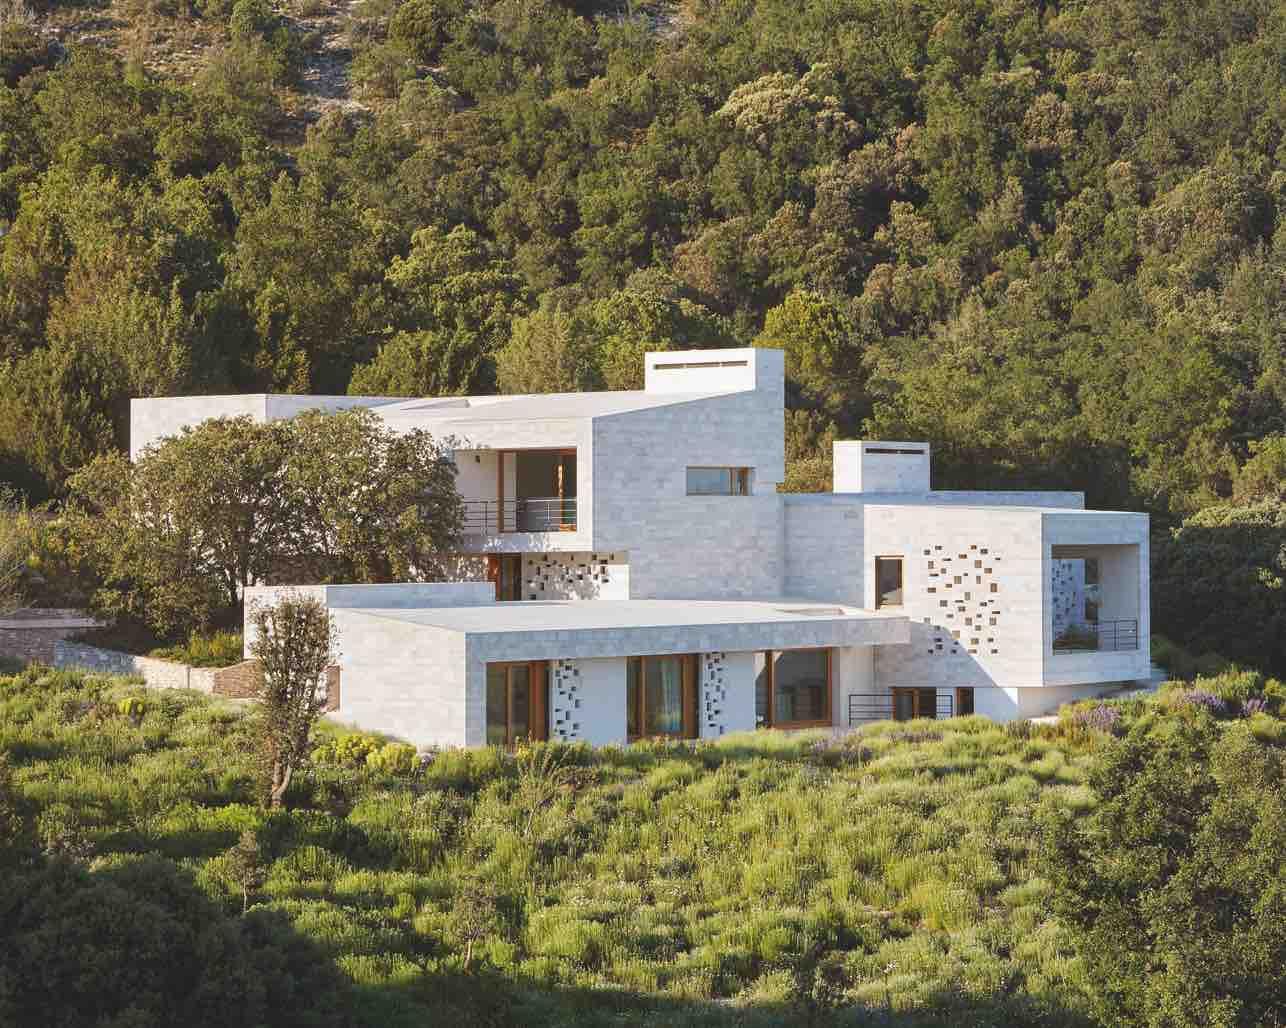 Henning Larsen Architects: Granja Experimental Alnardo, Valladolid, Castilla y León, Spain. Photograph © 2019 Hufton + Crow